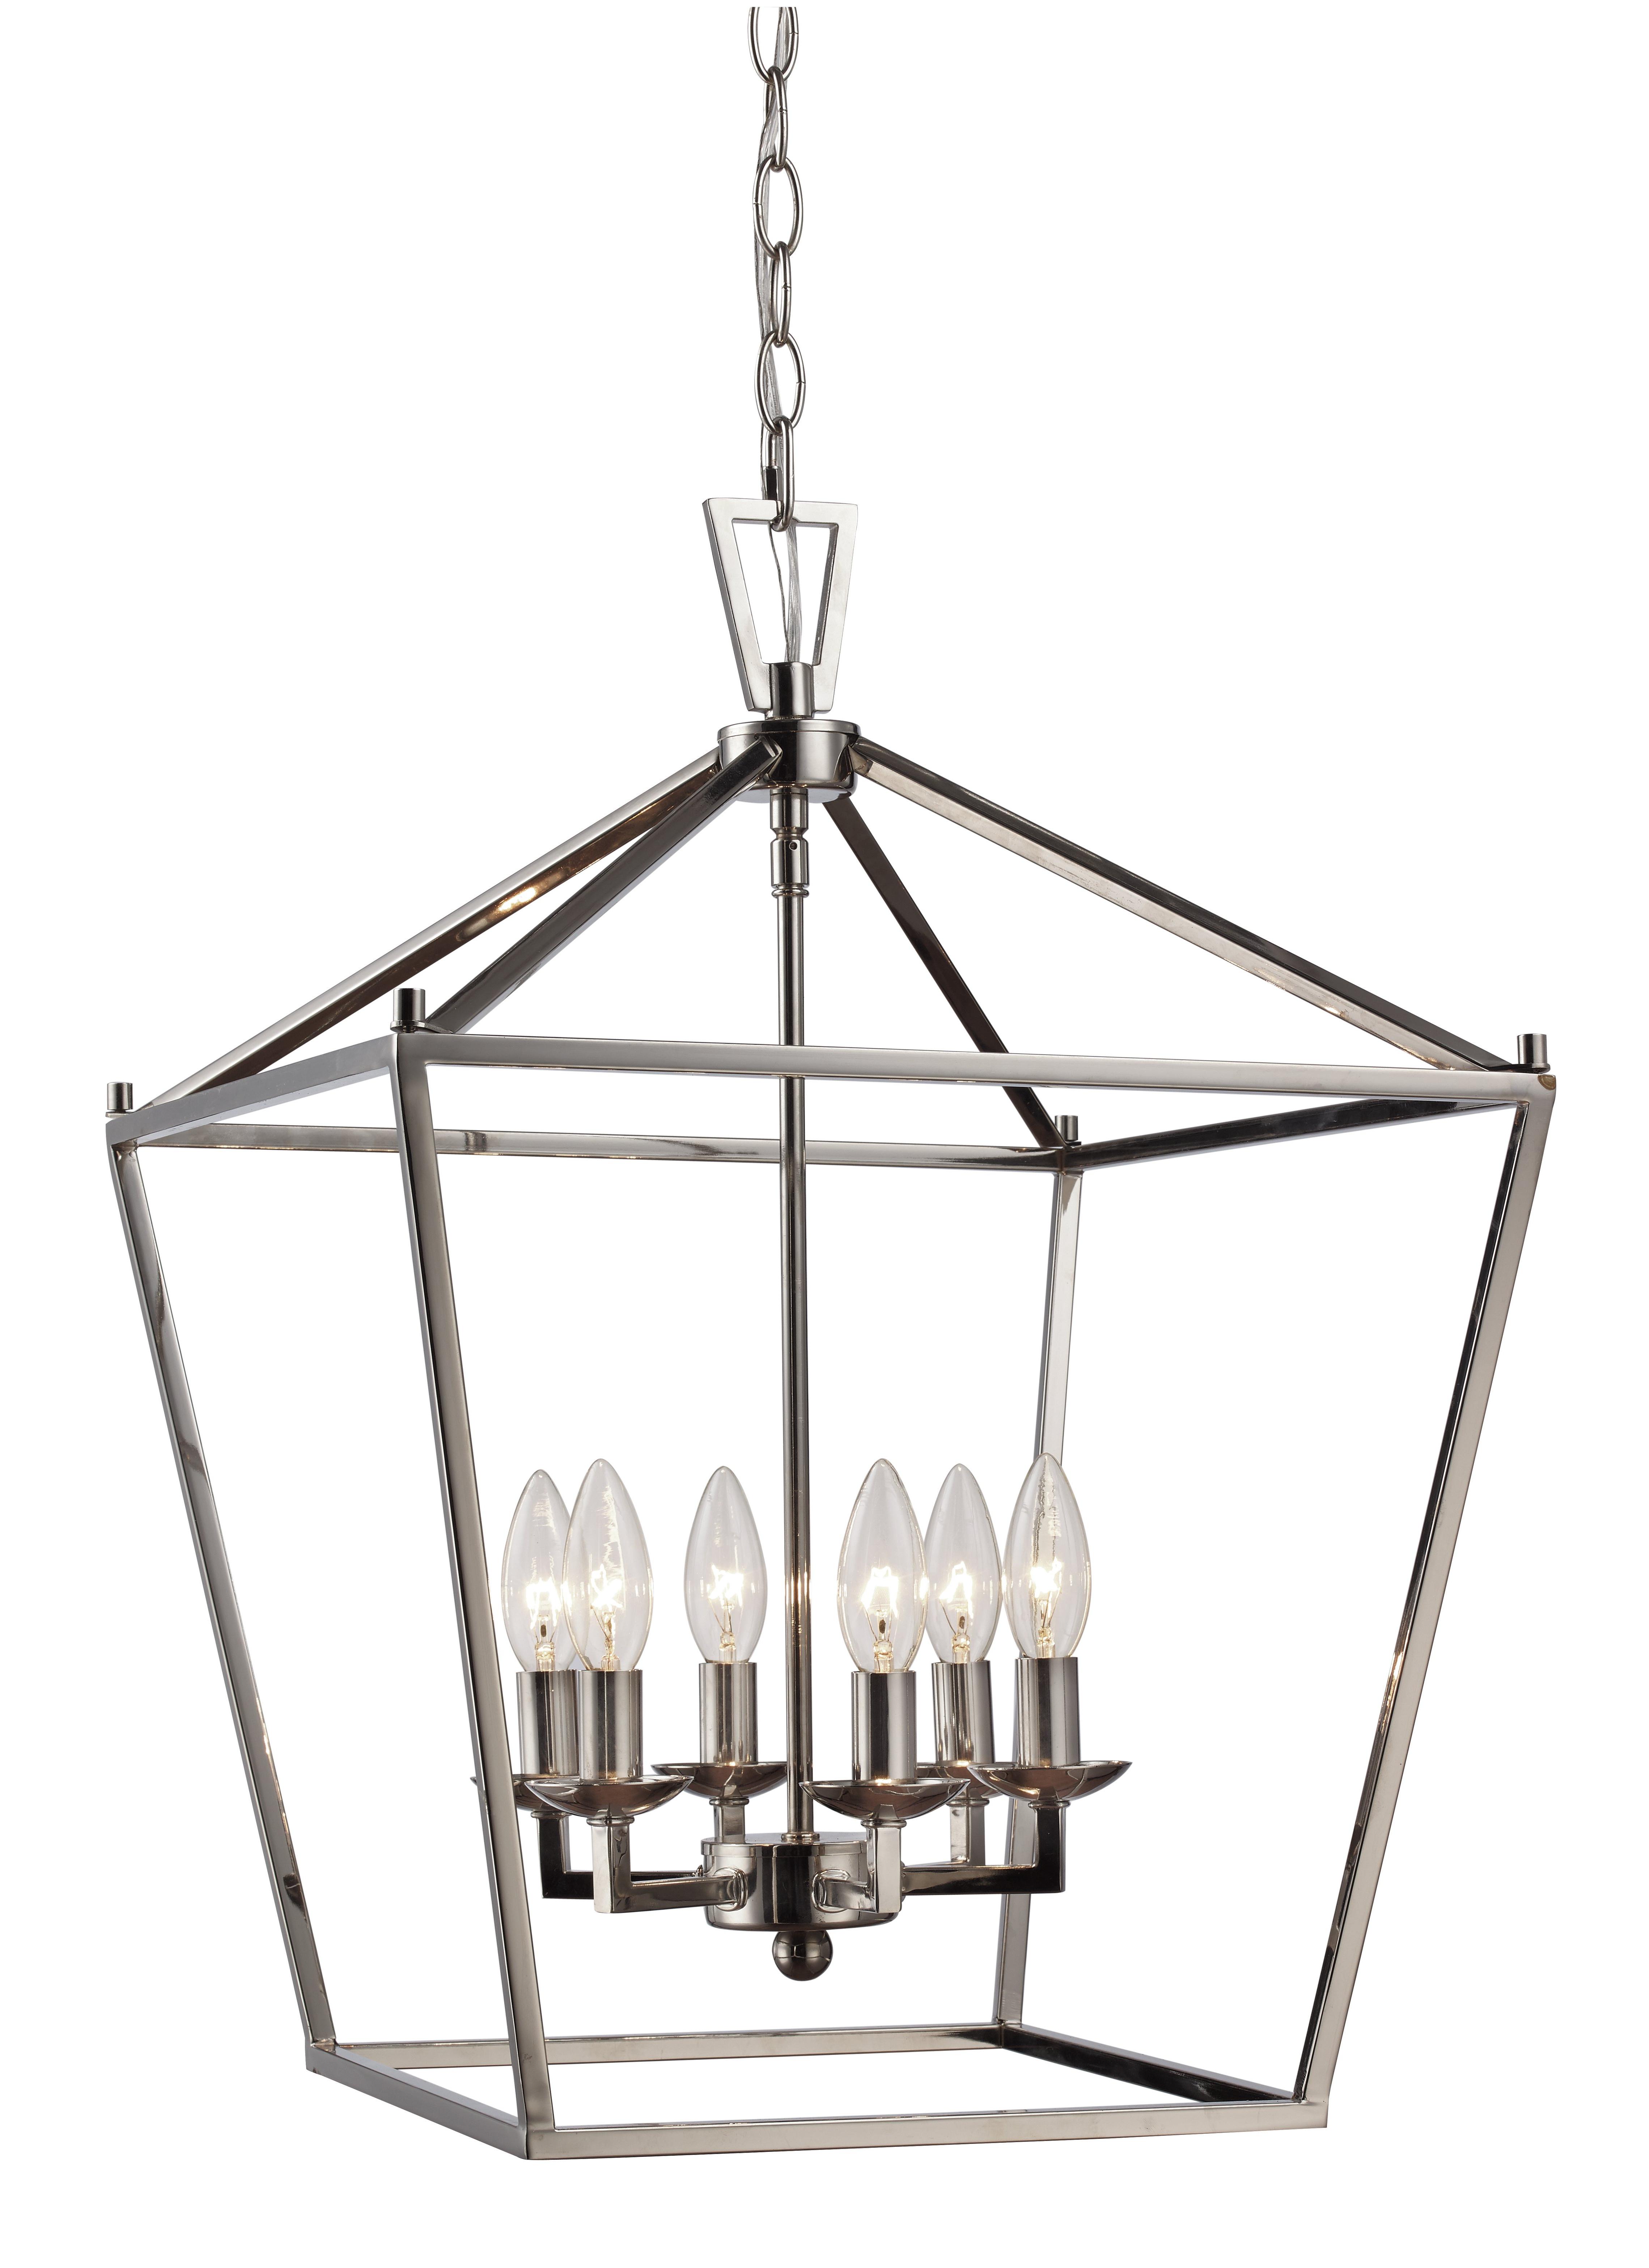 Favorite Carmen 6 Light Lantern Geometric Pendants Pertaining To Carmen 6 Light Lantern Geometric Pendant (View 10 of 25)